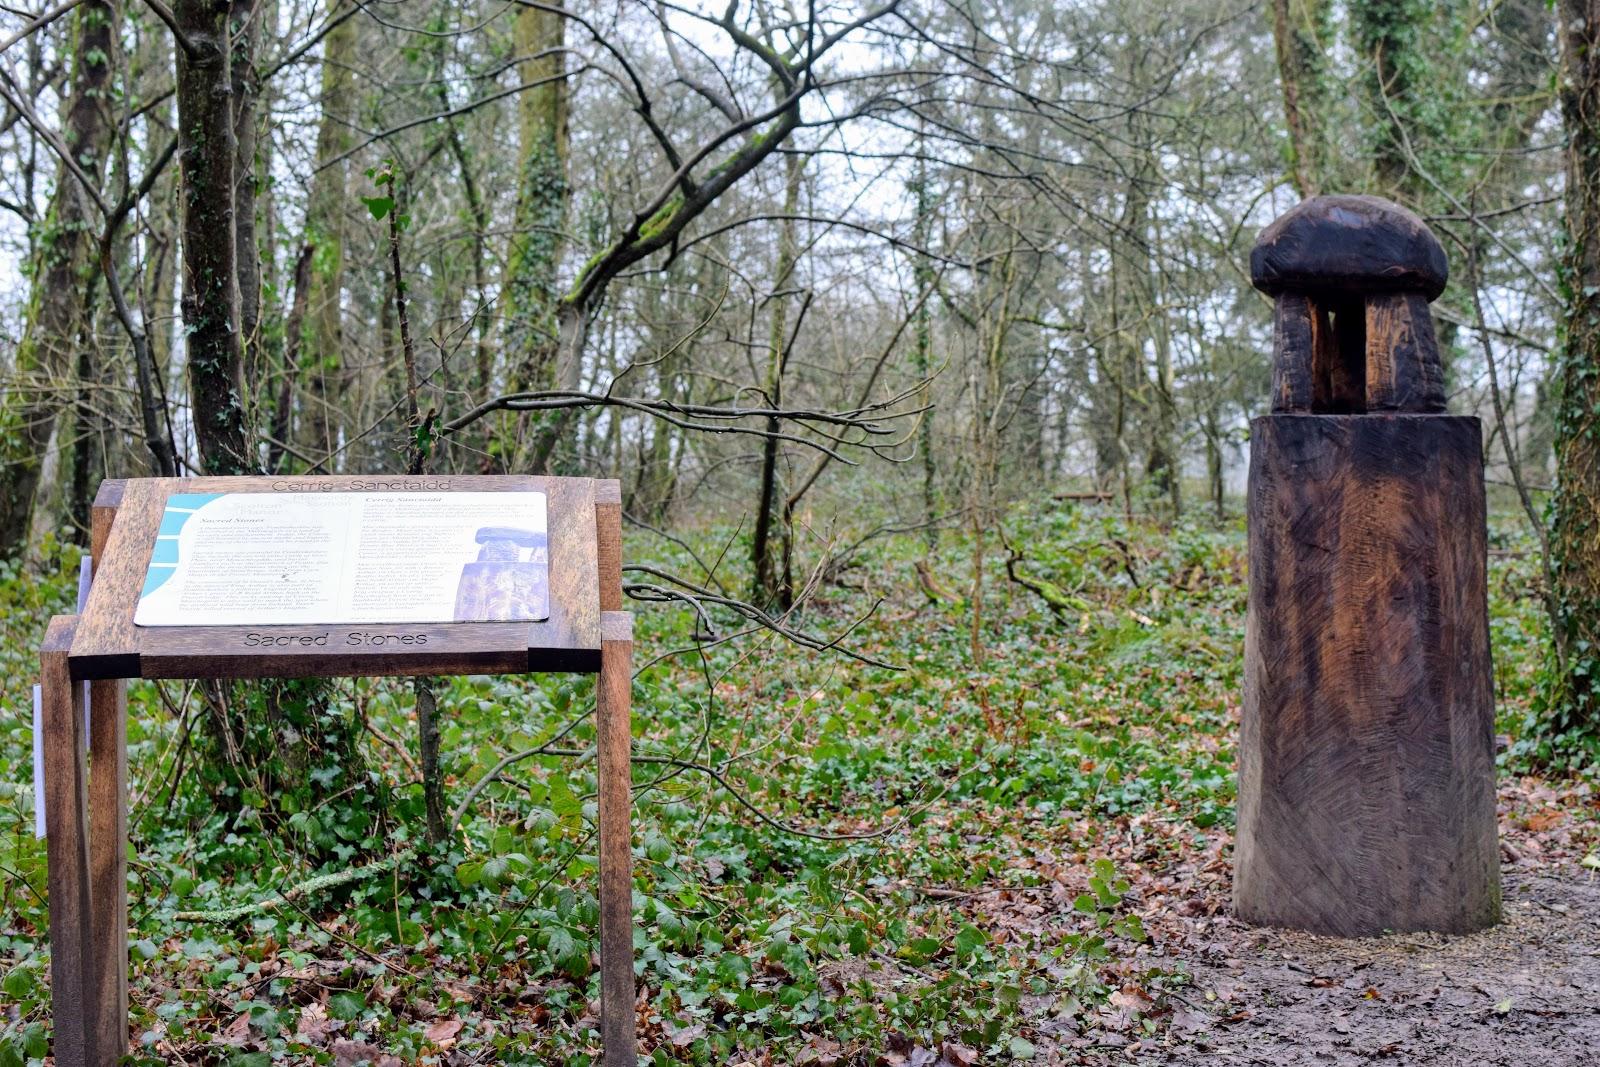 , Scolton Manor:  Myths and Legends Sculpture Trail, Pembrokeshire